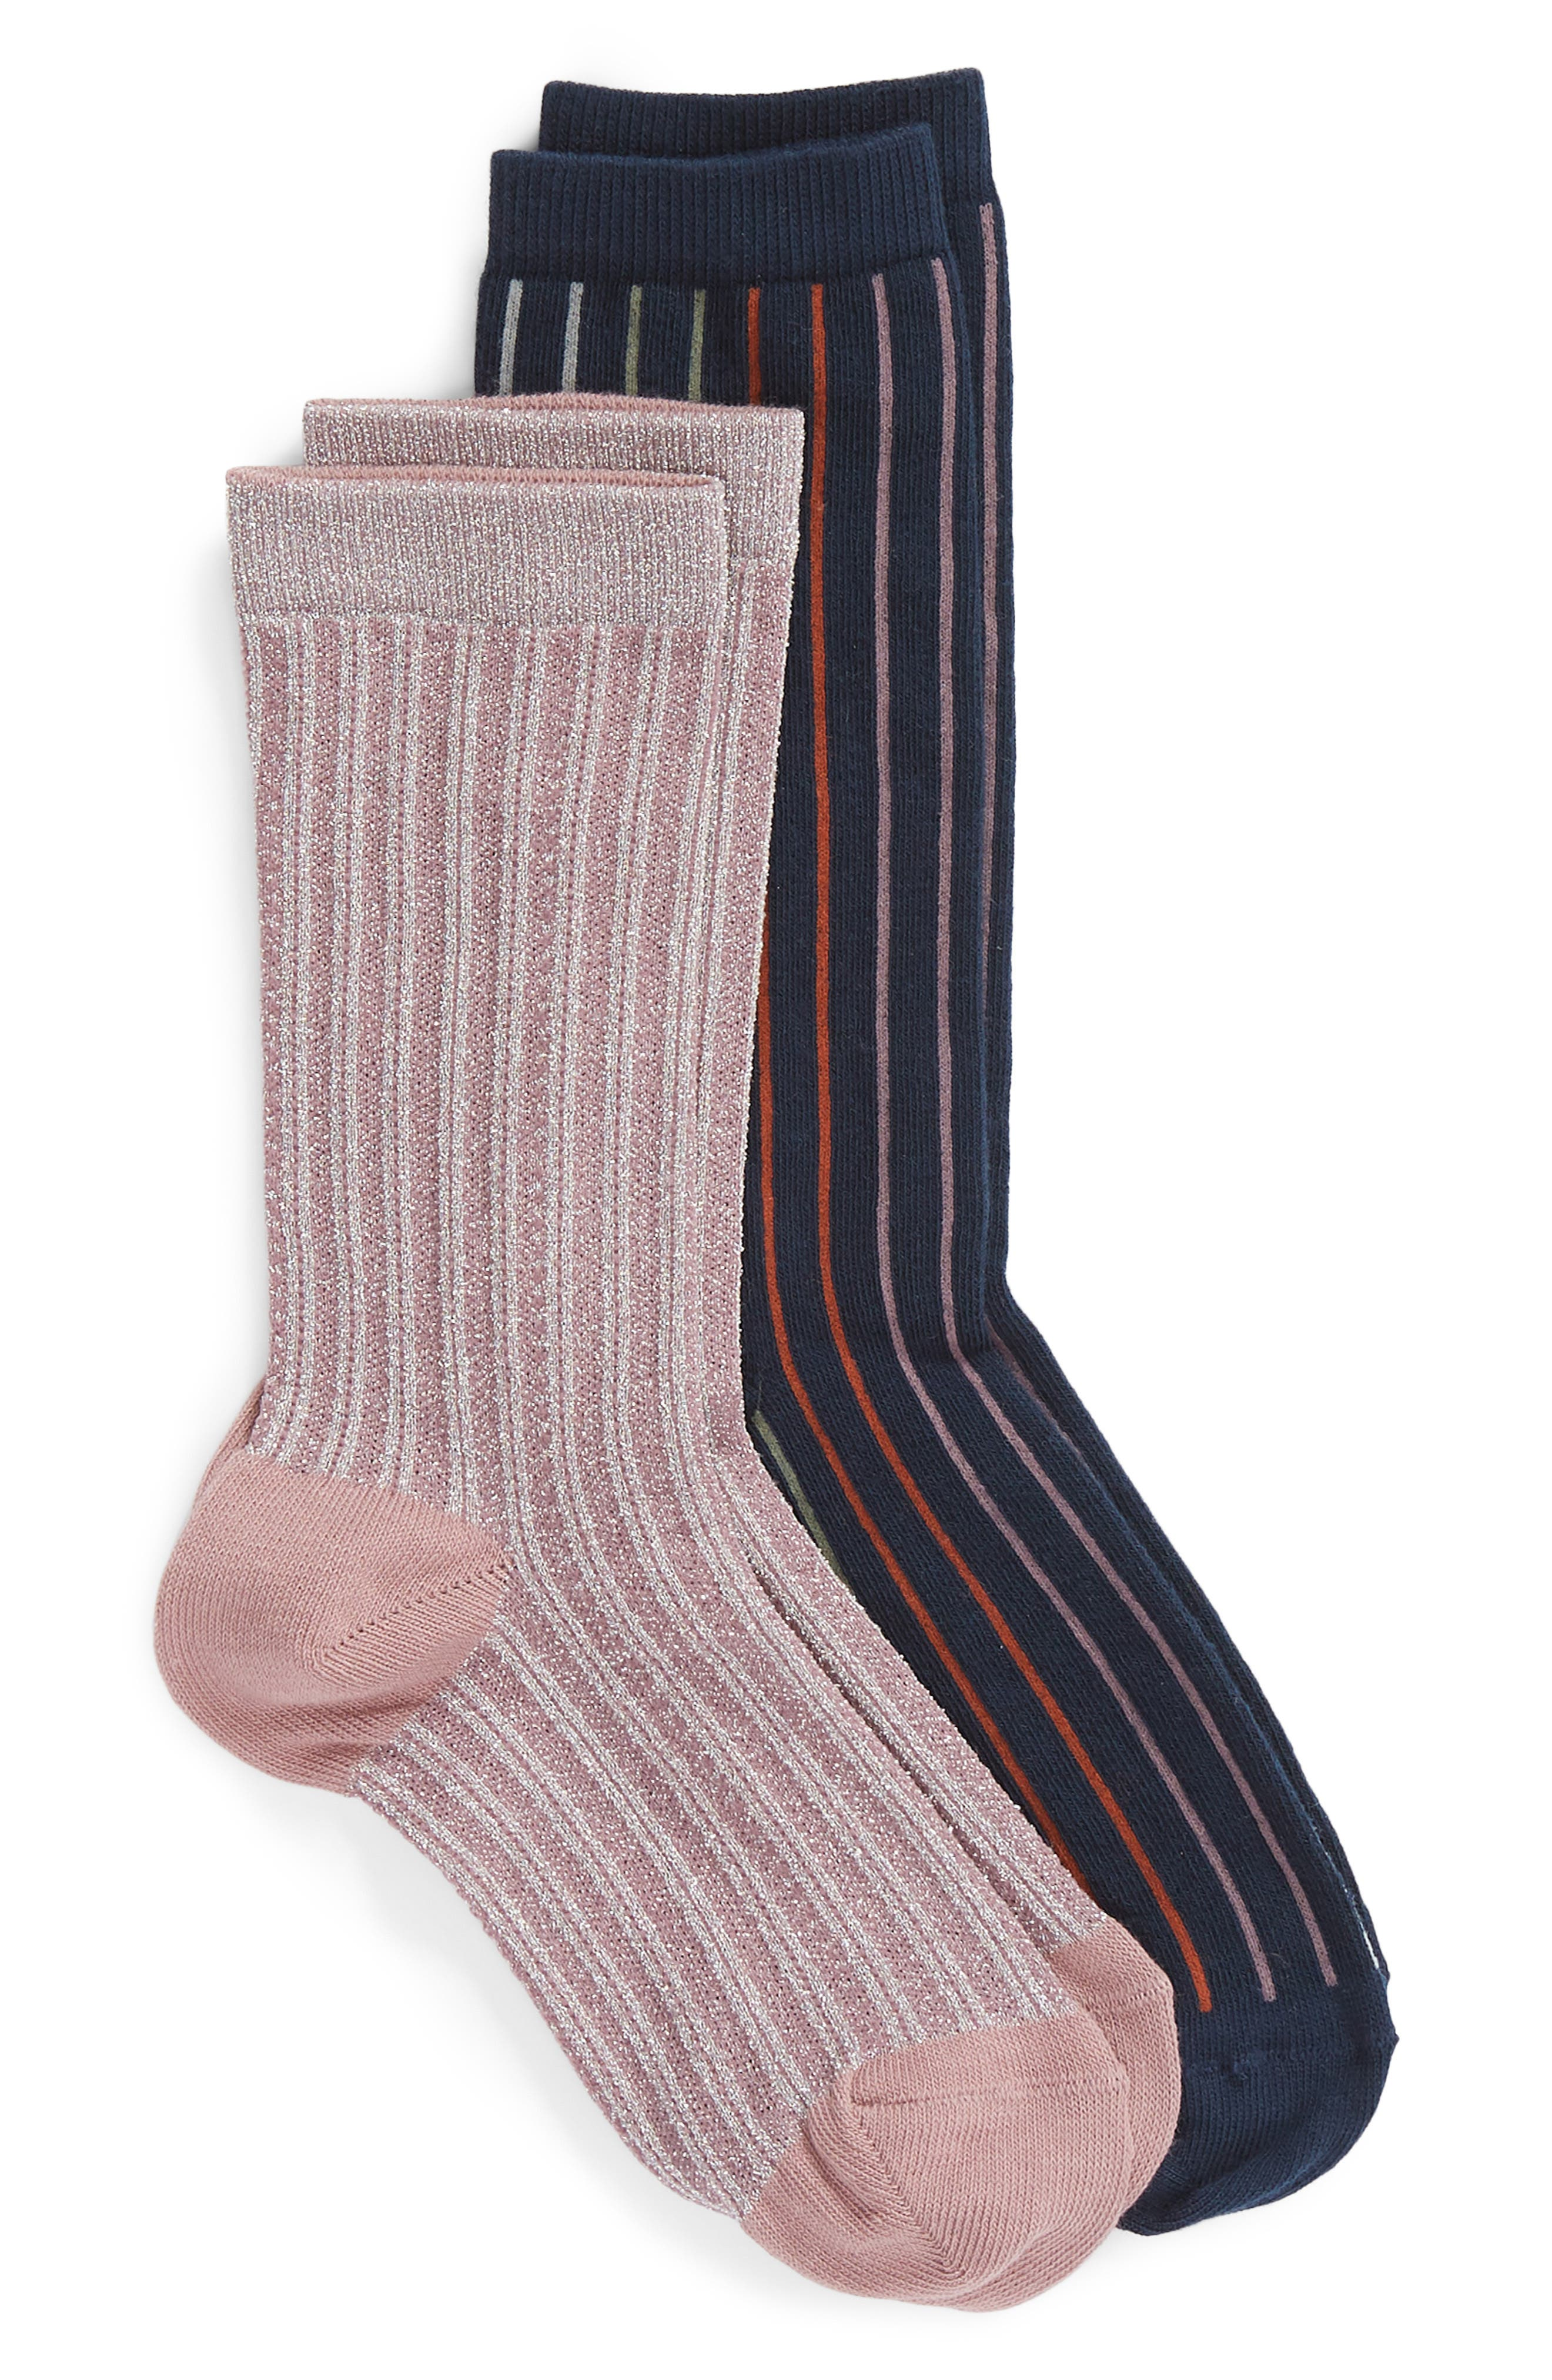 2-Pack Vertical Stripe Crew Socks,                             Main thumbnail 1, color,                             NAVY MARITIME MULTI